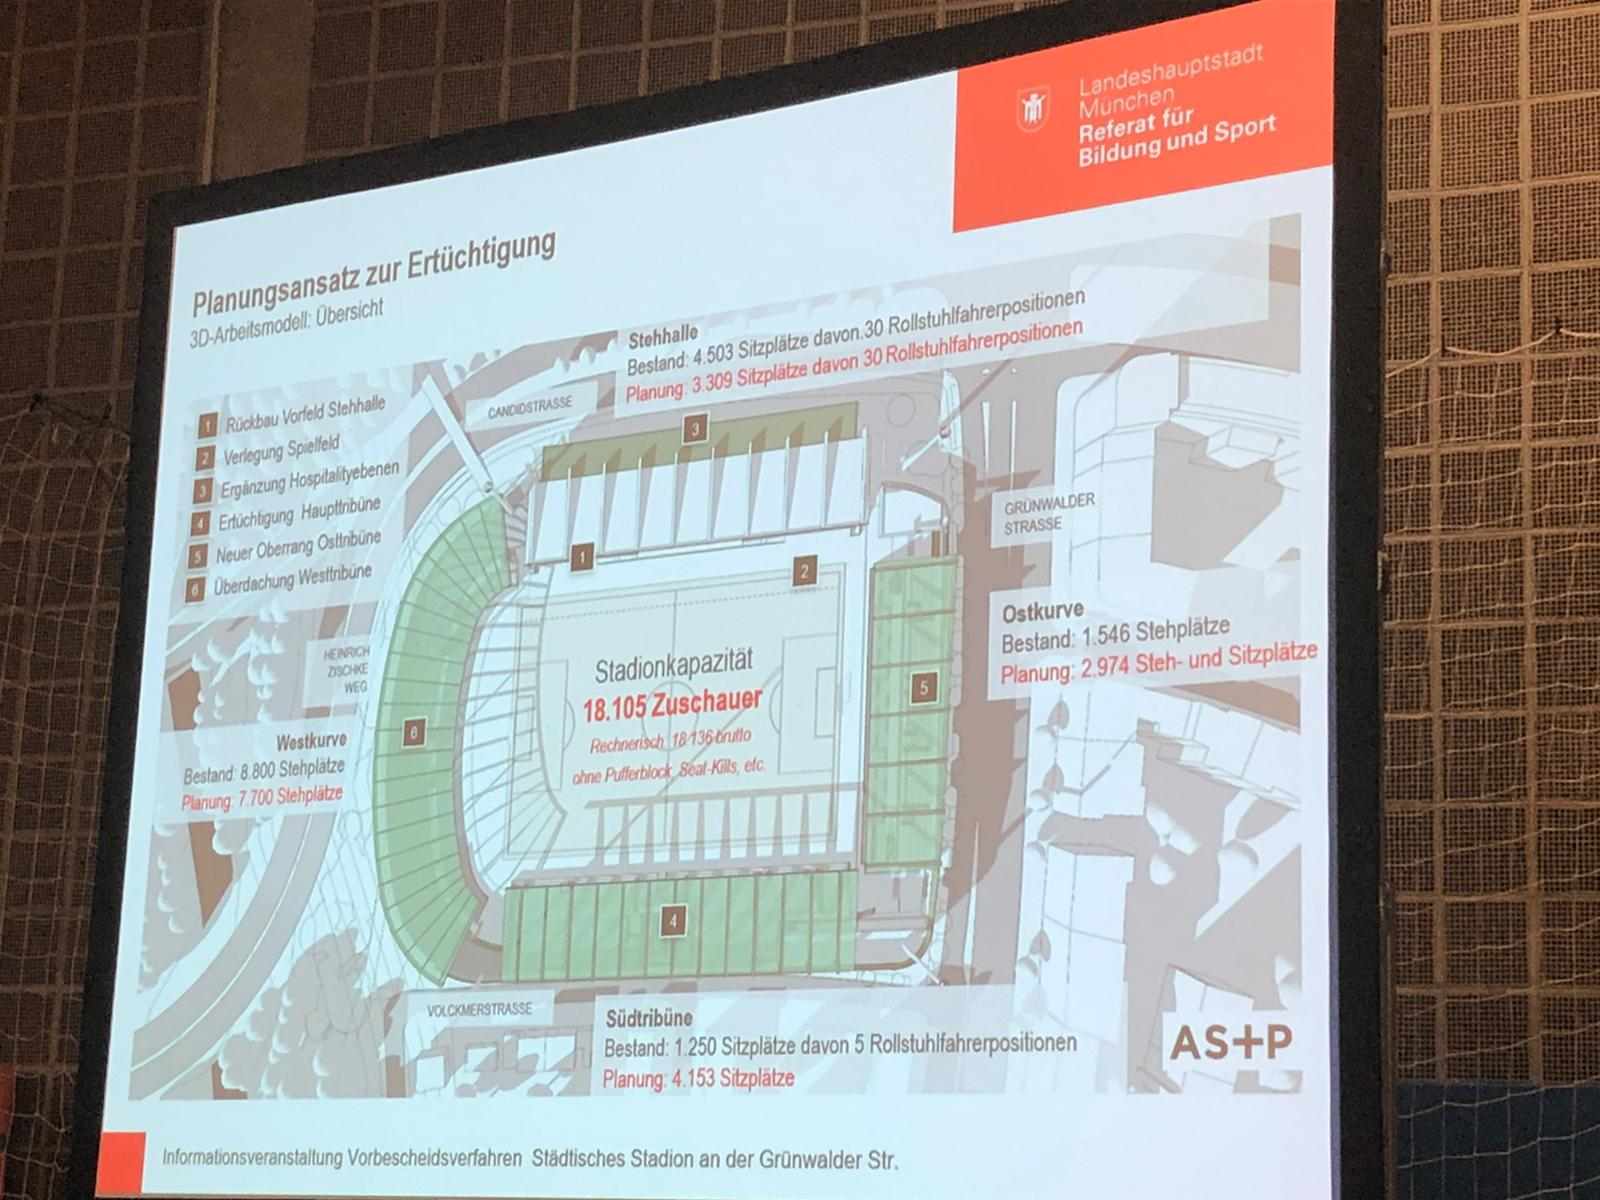 Grünwalder Stadion Umbau